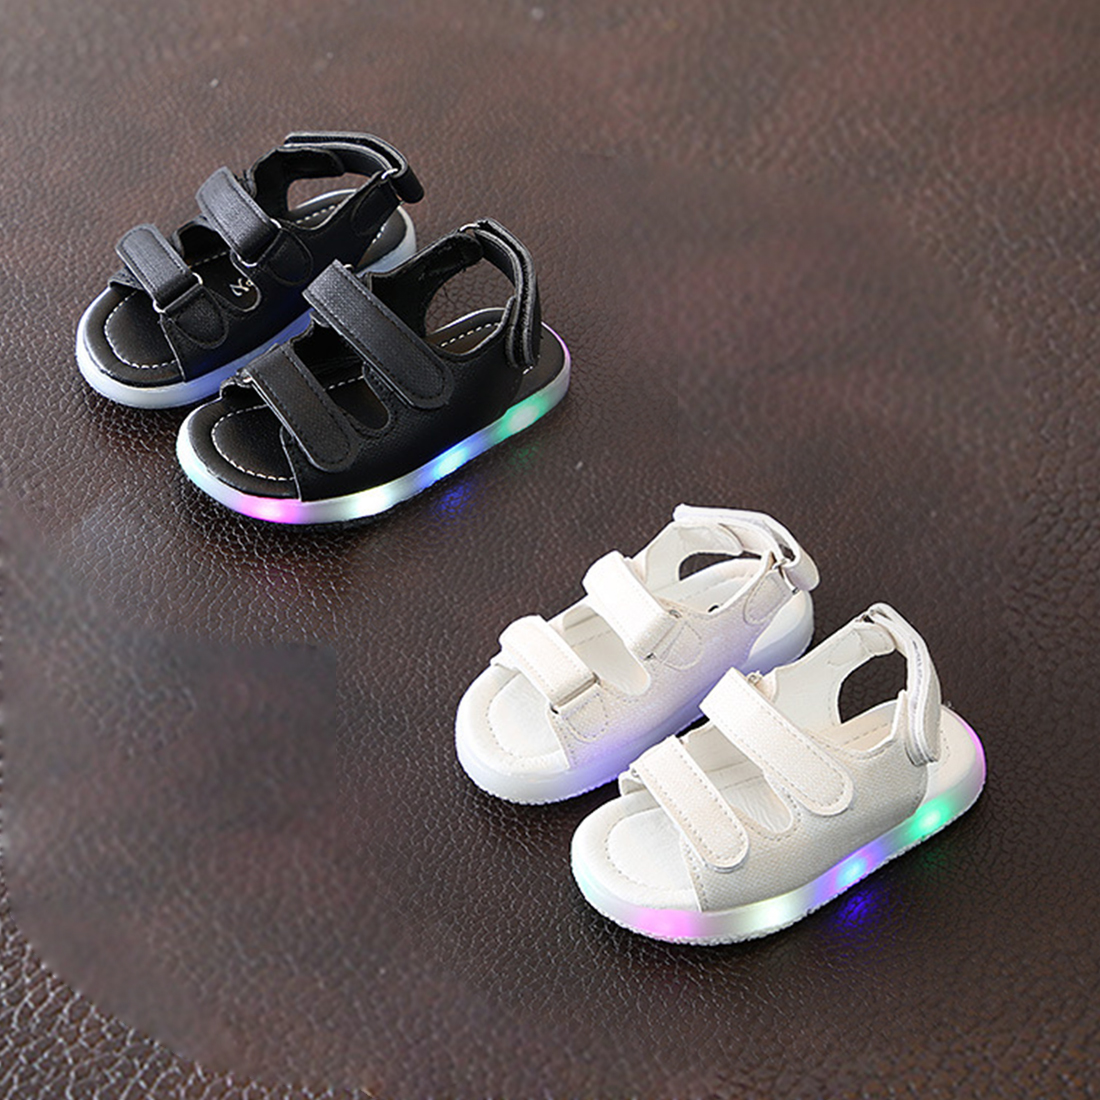 Summer Velcro Children Sandals Summer Non-Slip First Walkers Infant Kids Baby Girls Beach Sneaker Sandals Casual Shoes